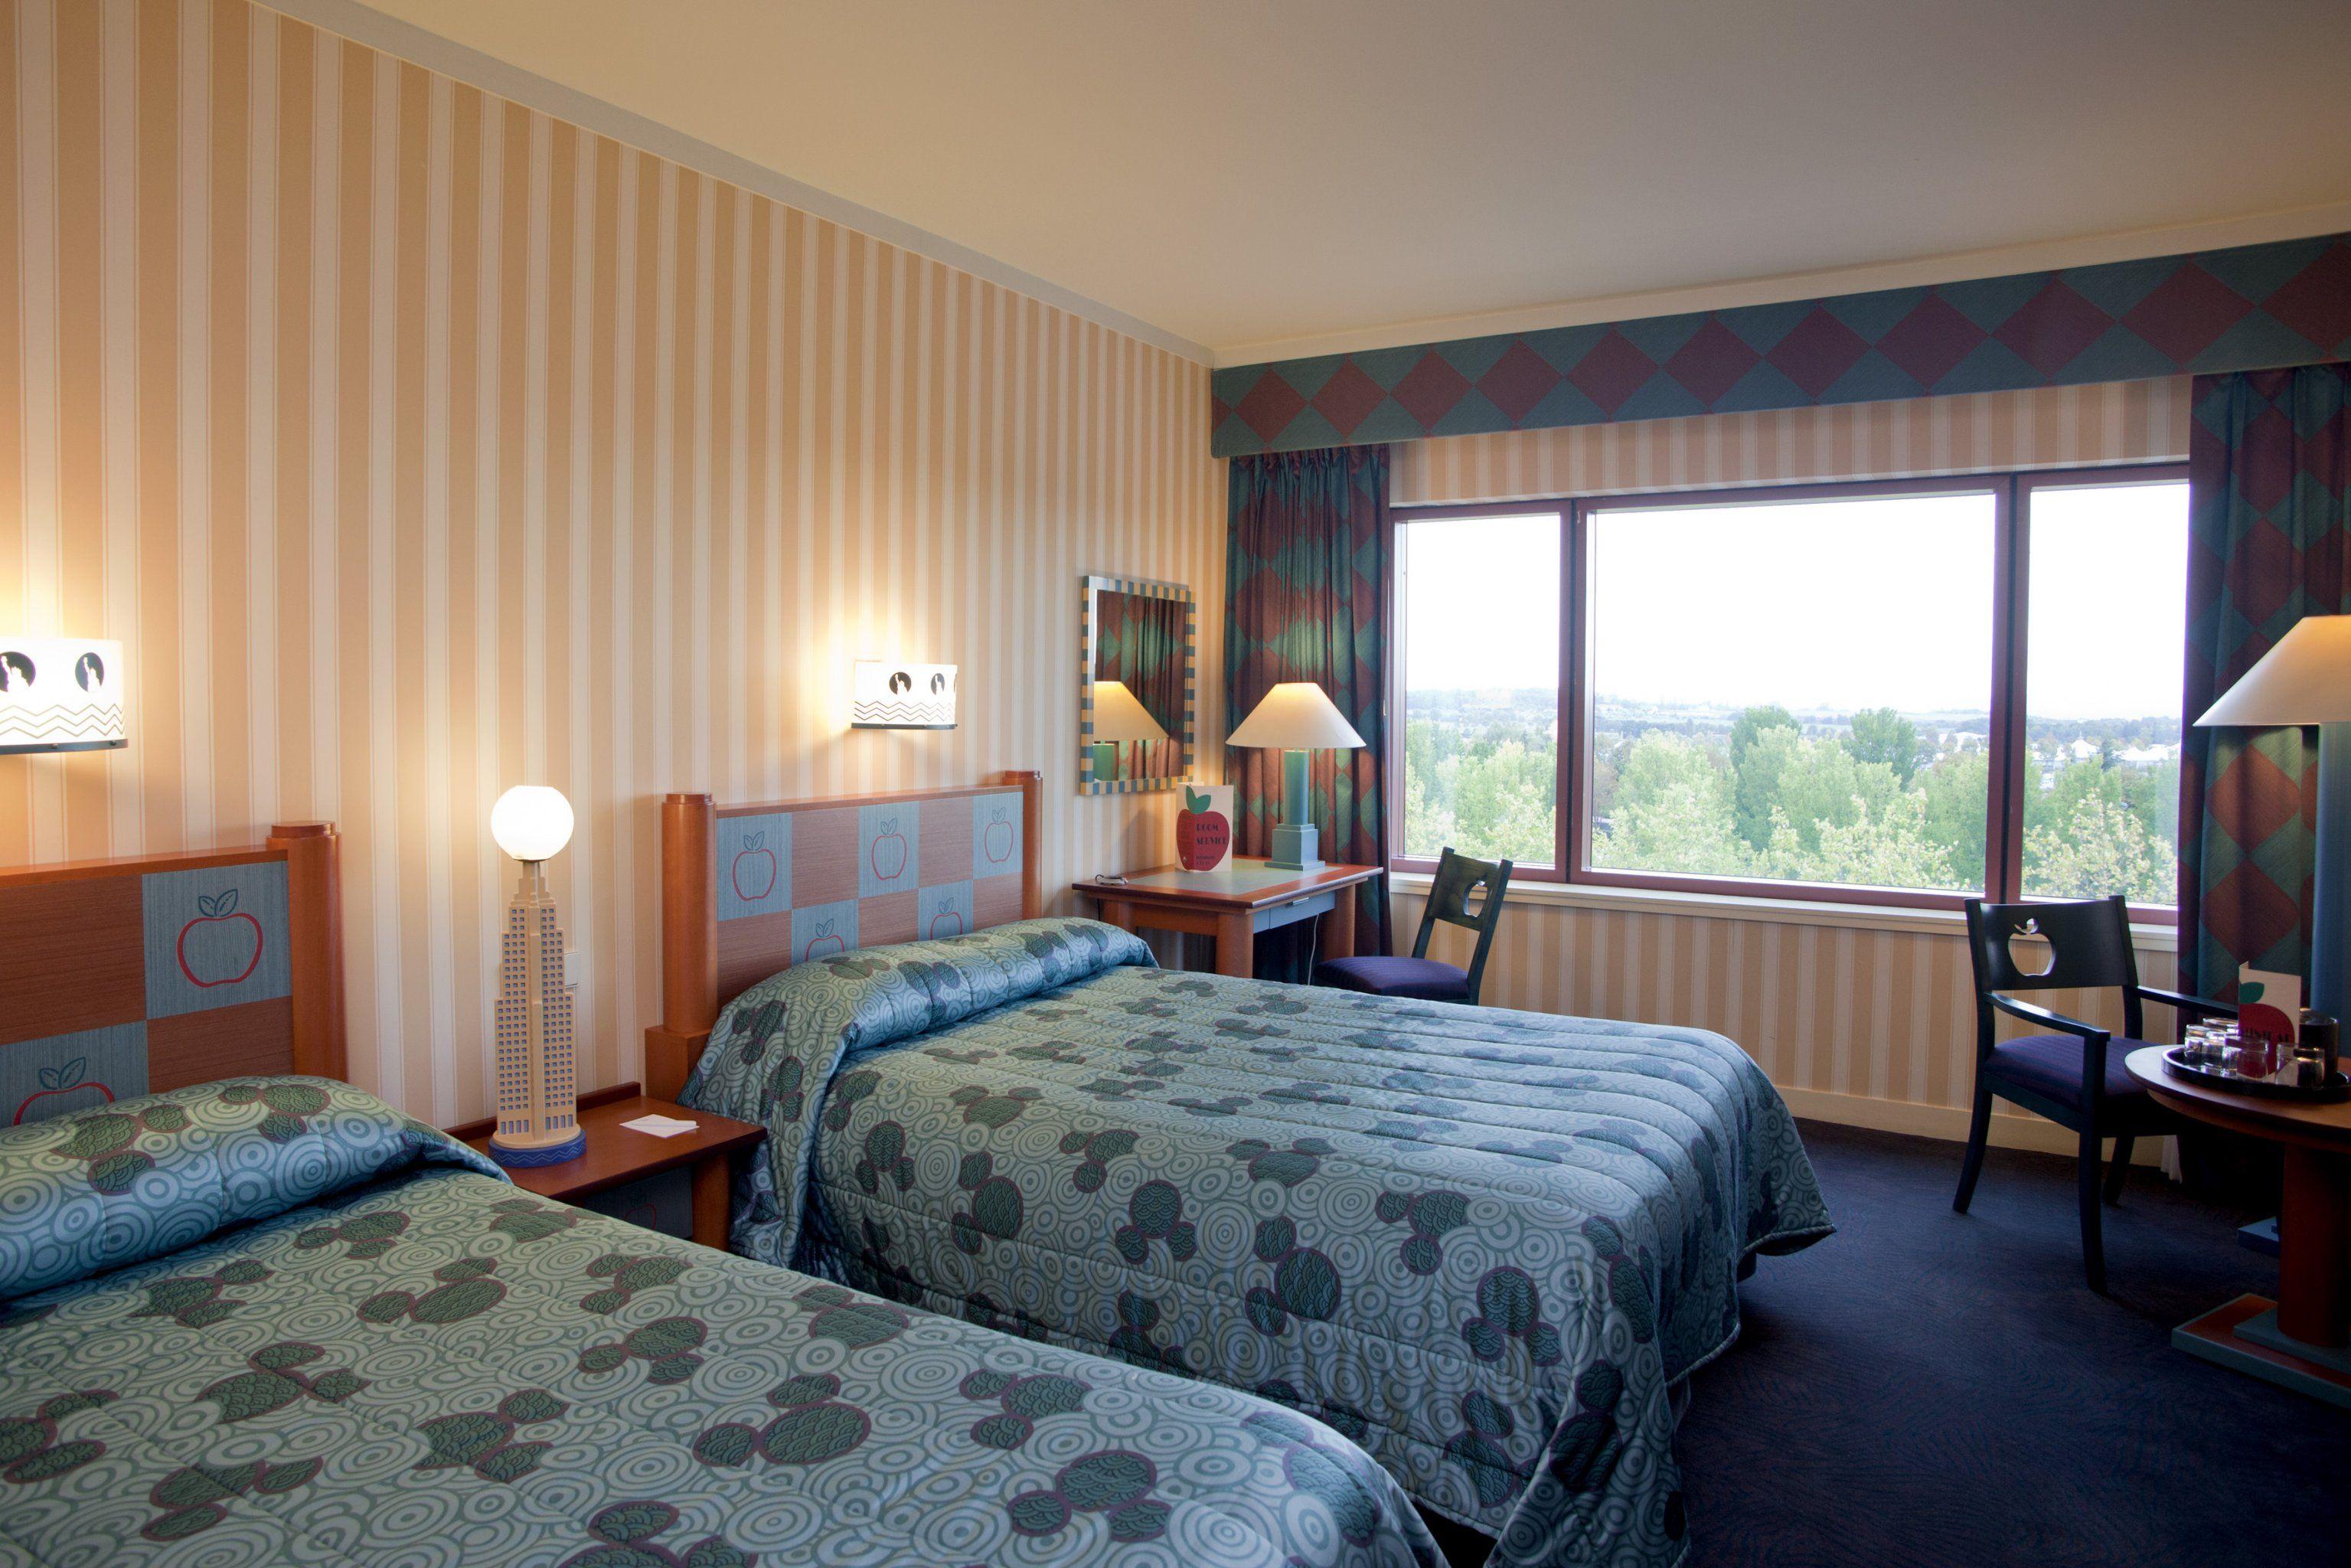 Disney Hotels Hotel York - Standard Double Room